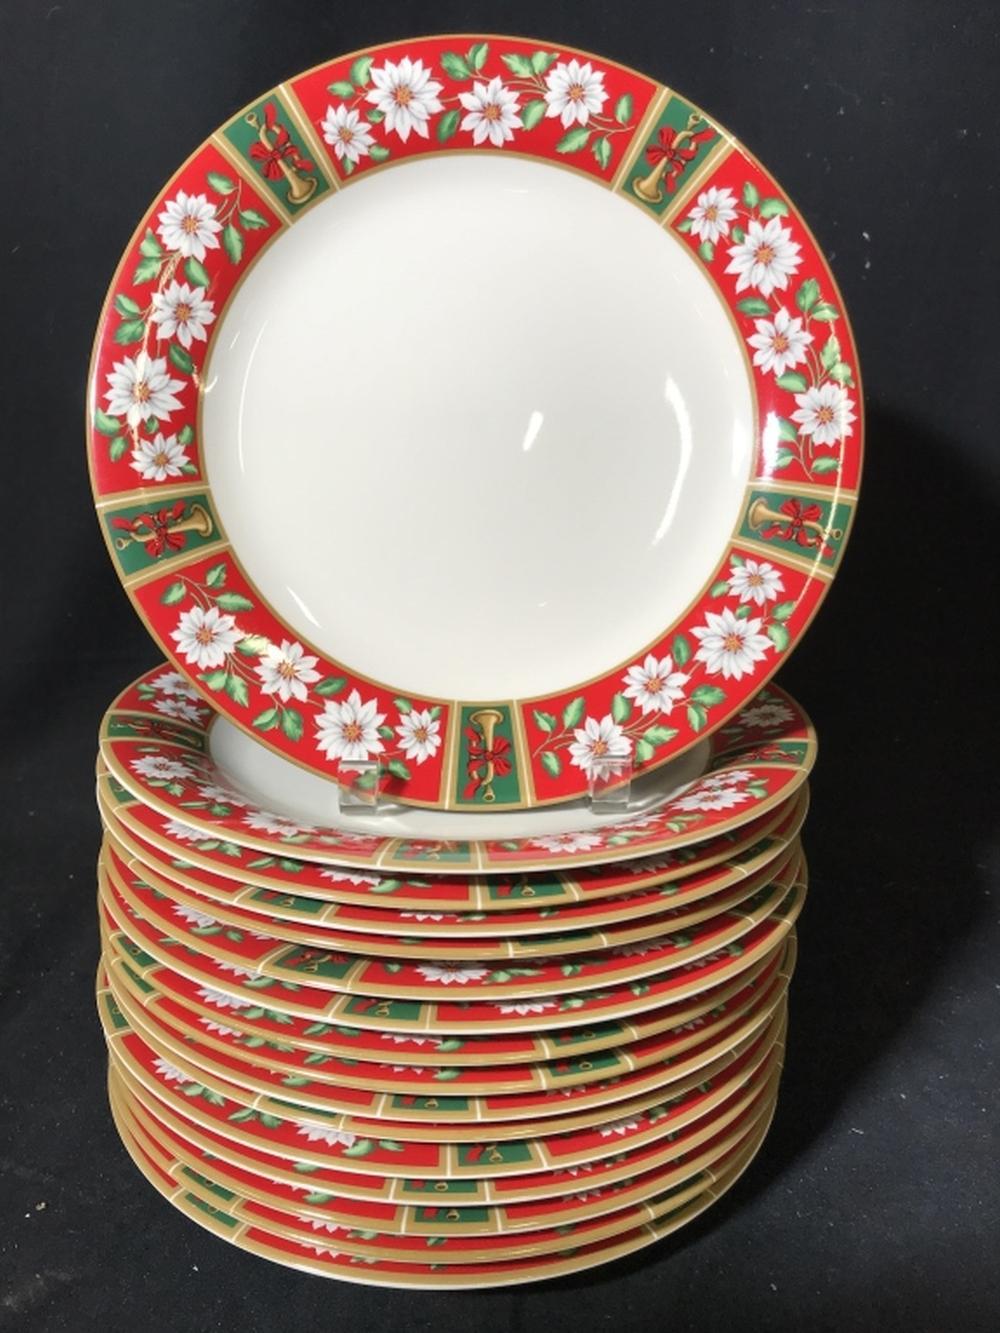 Large Christmas Porcelain Dinner Ware Set